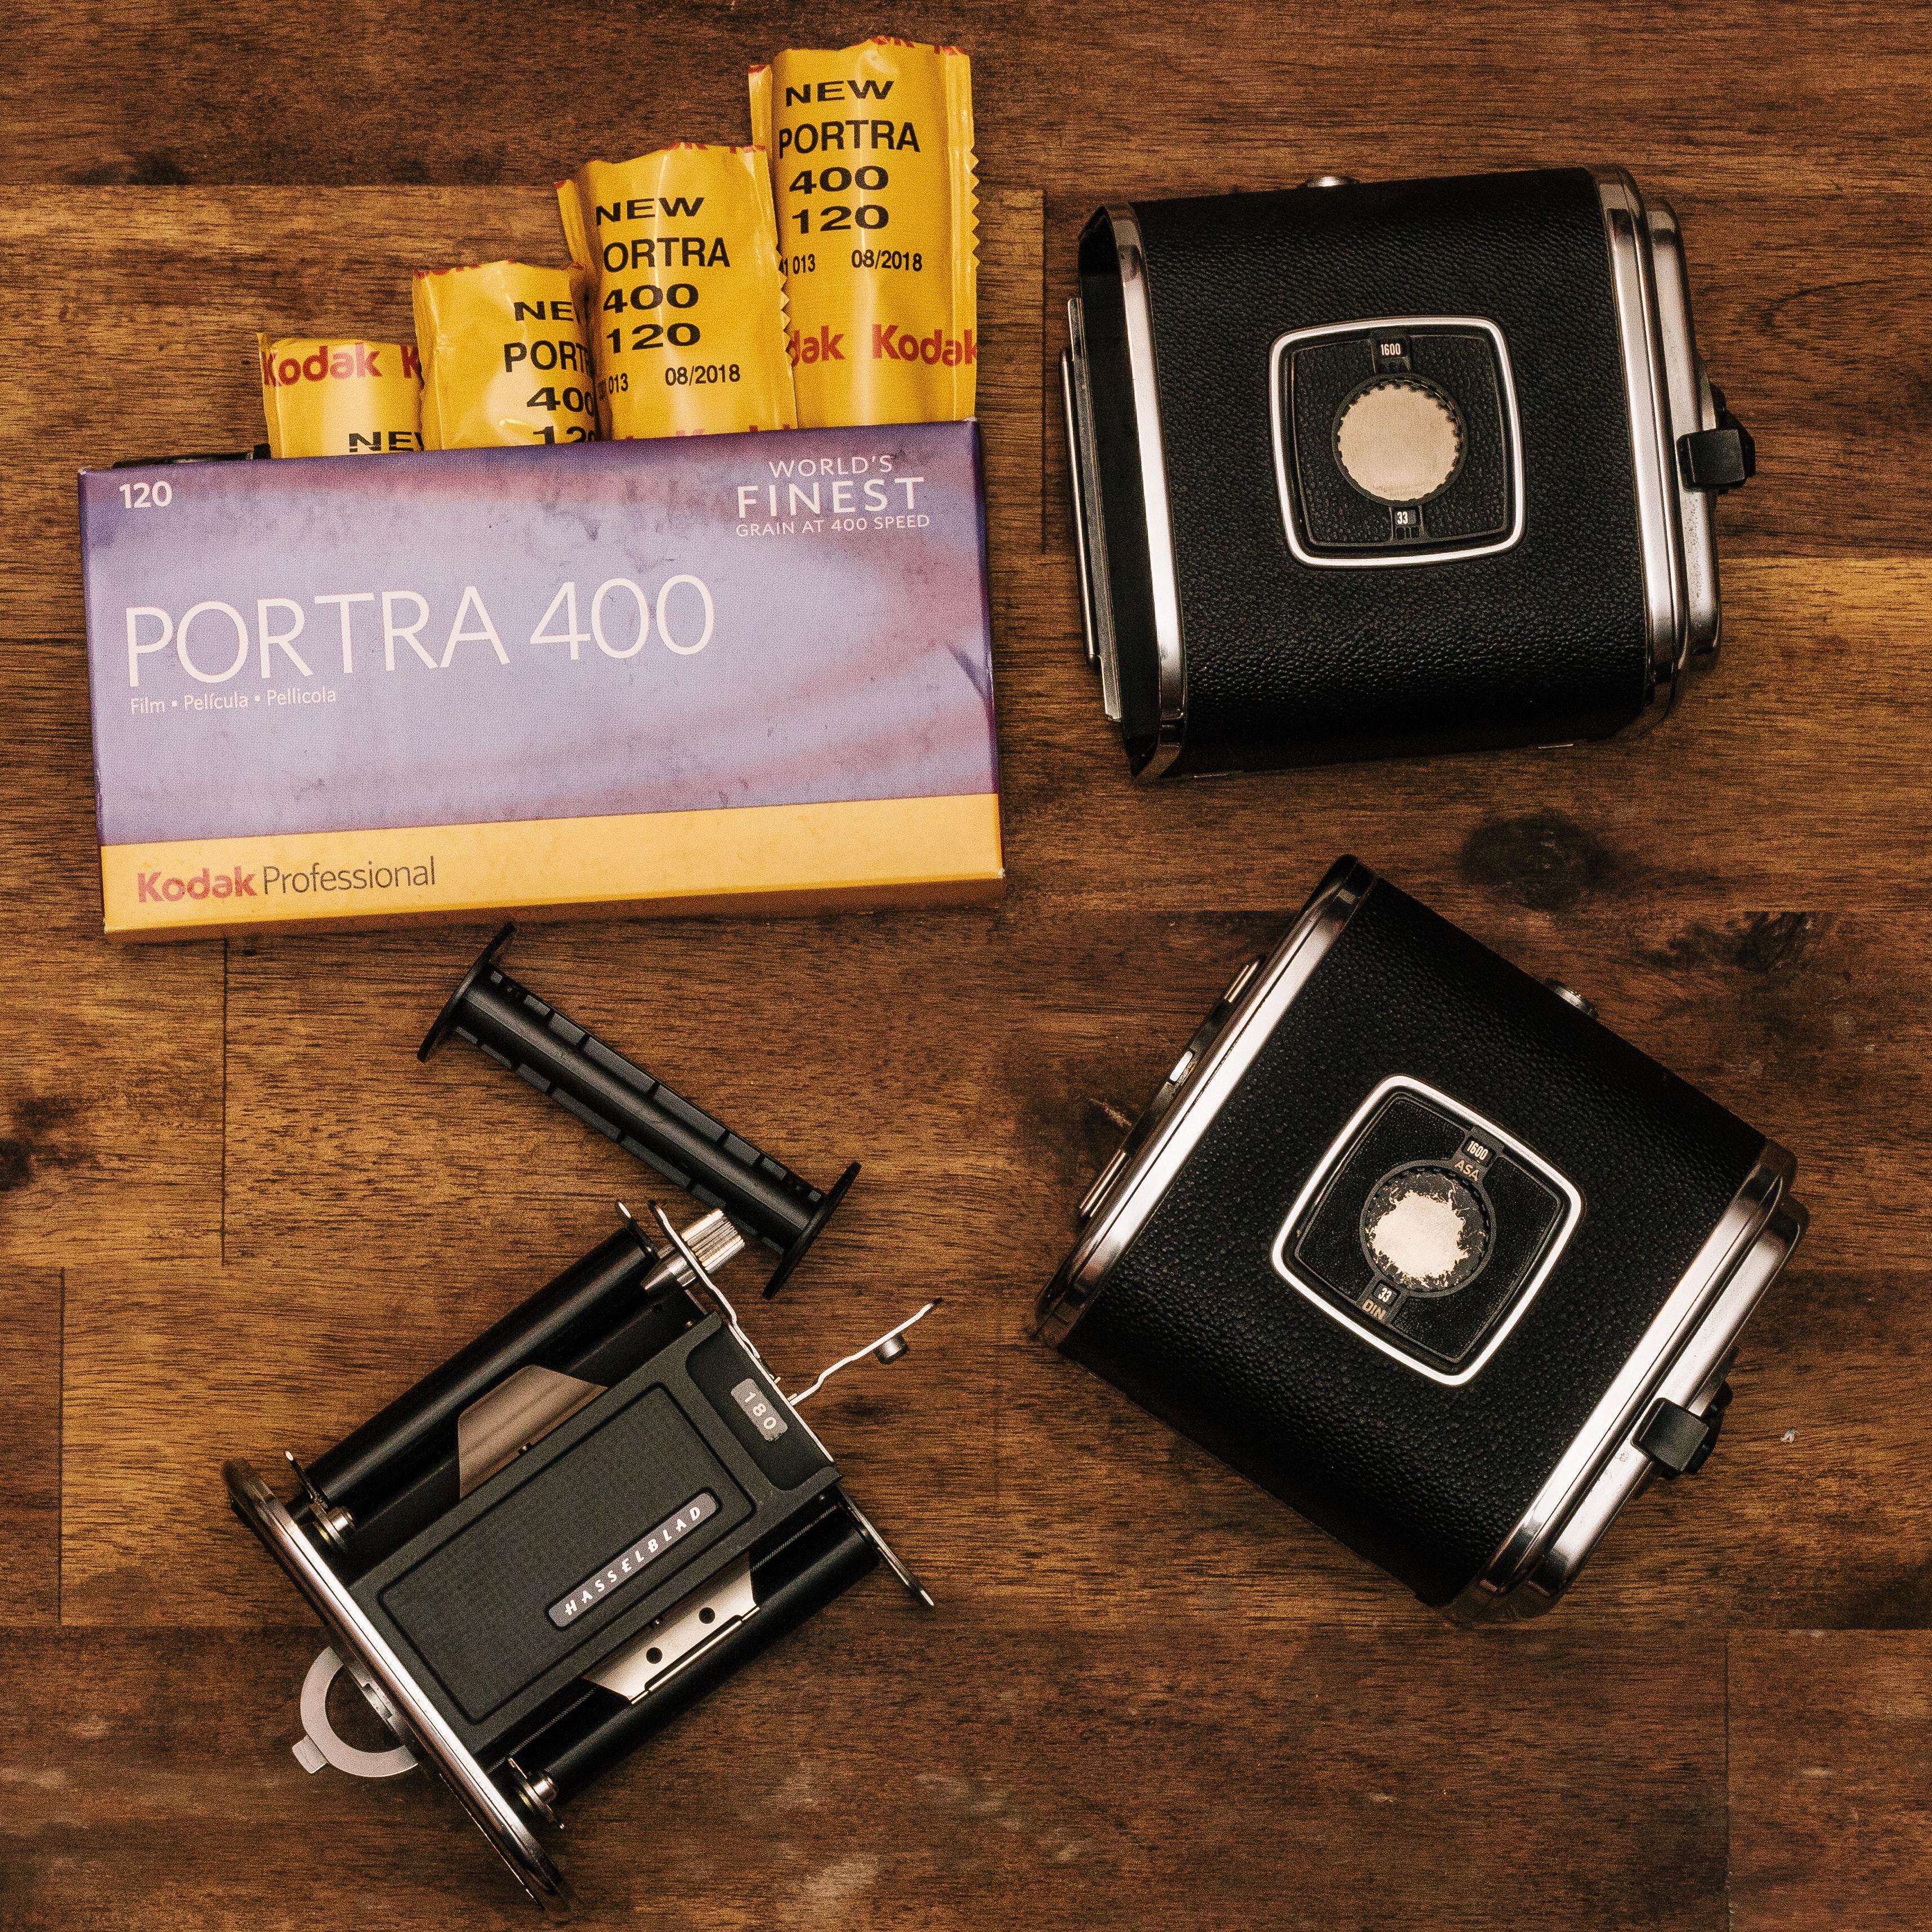 Kodak porta 400 with black cases photo